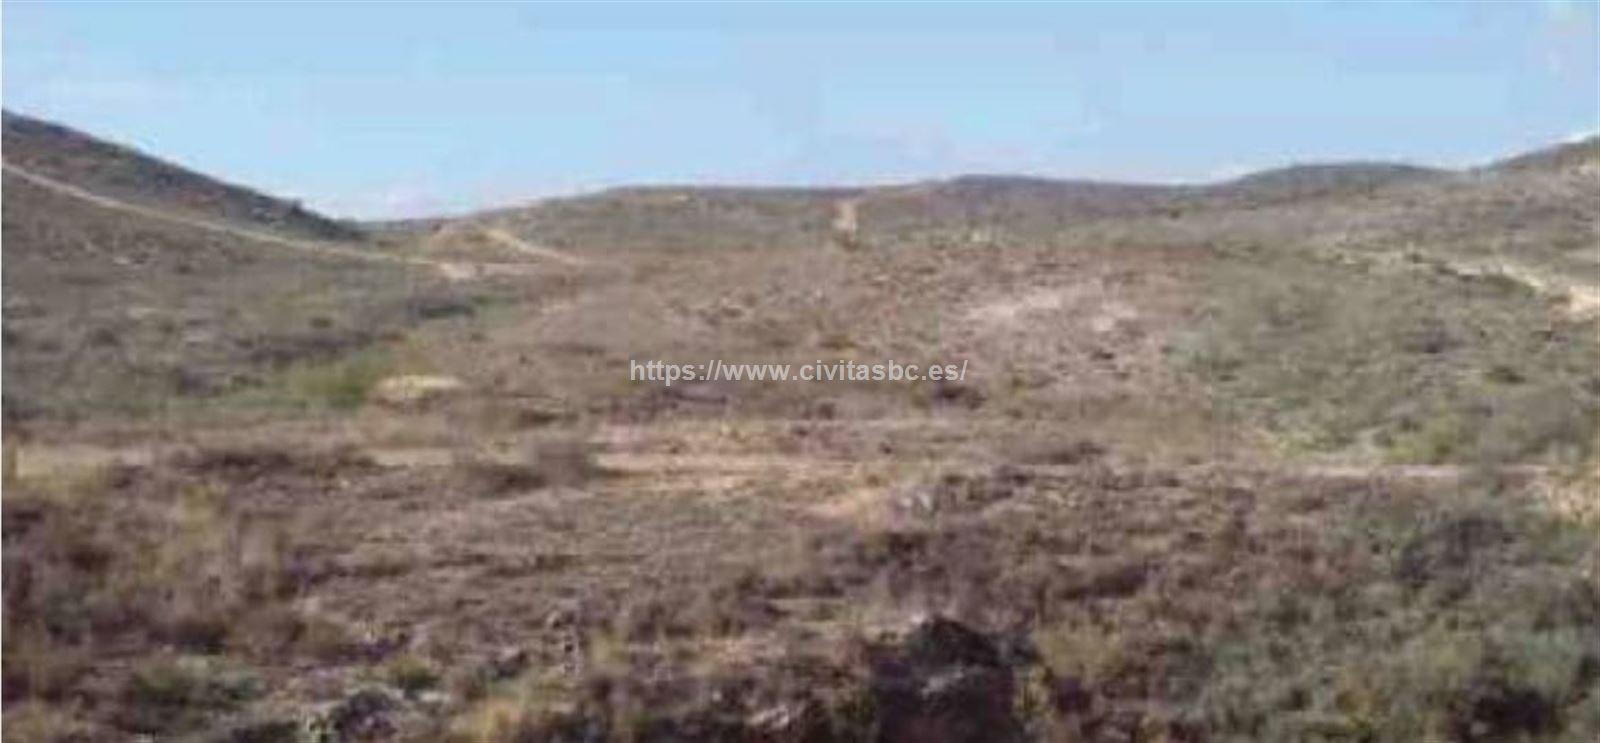 LAND in URBANIZACIONES